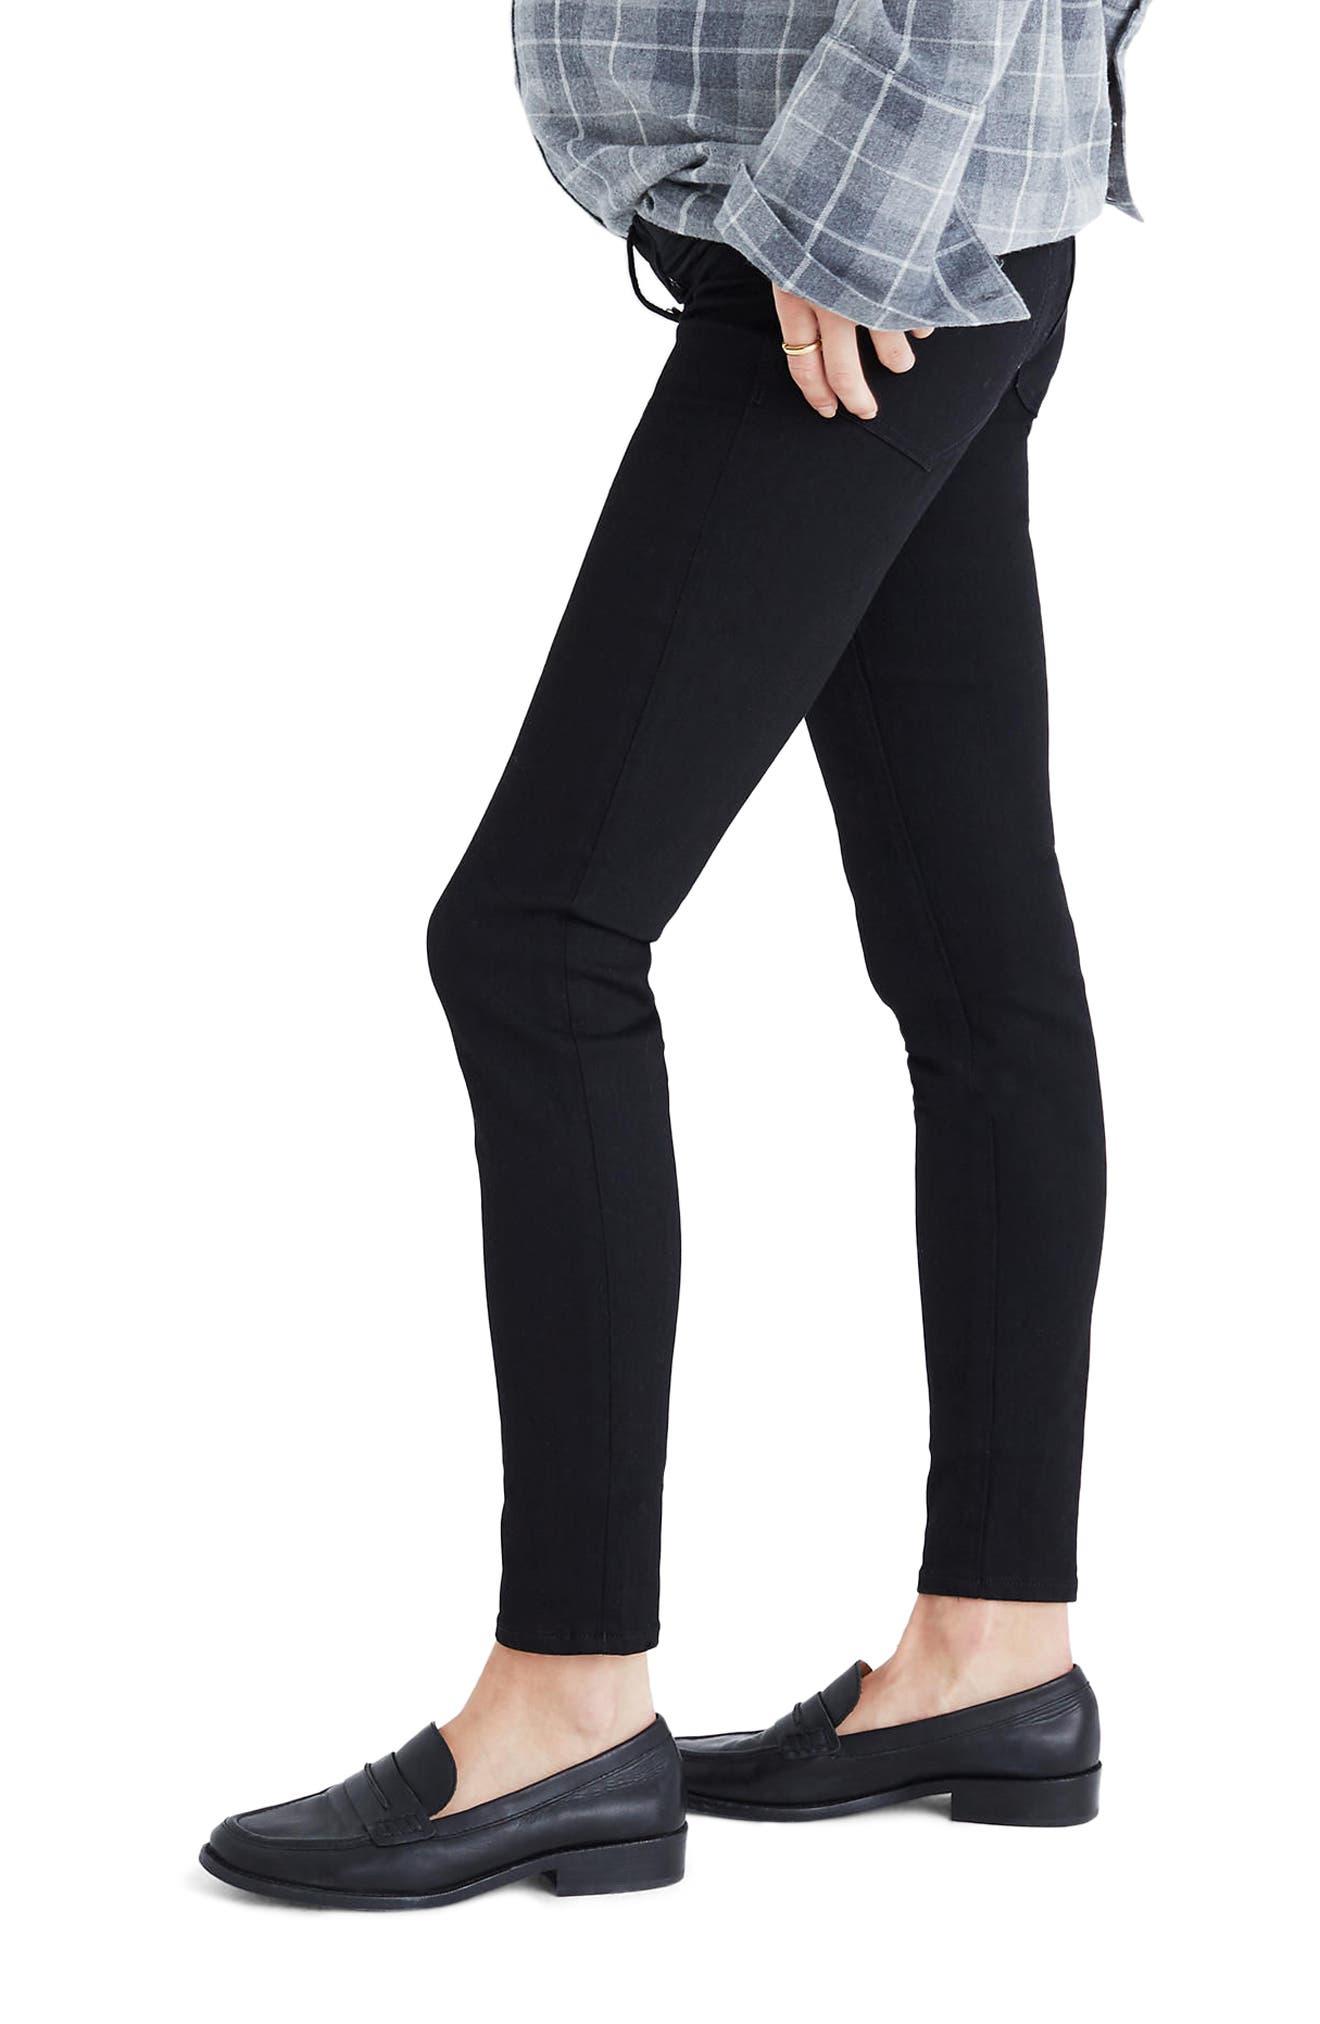 Maternity Skinny Jeans,                             Alternate thumbnail 3, color,                             001